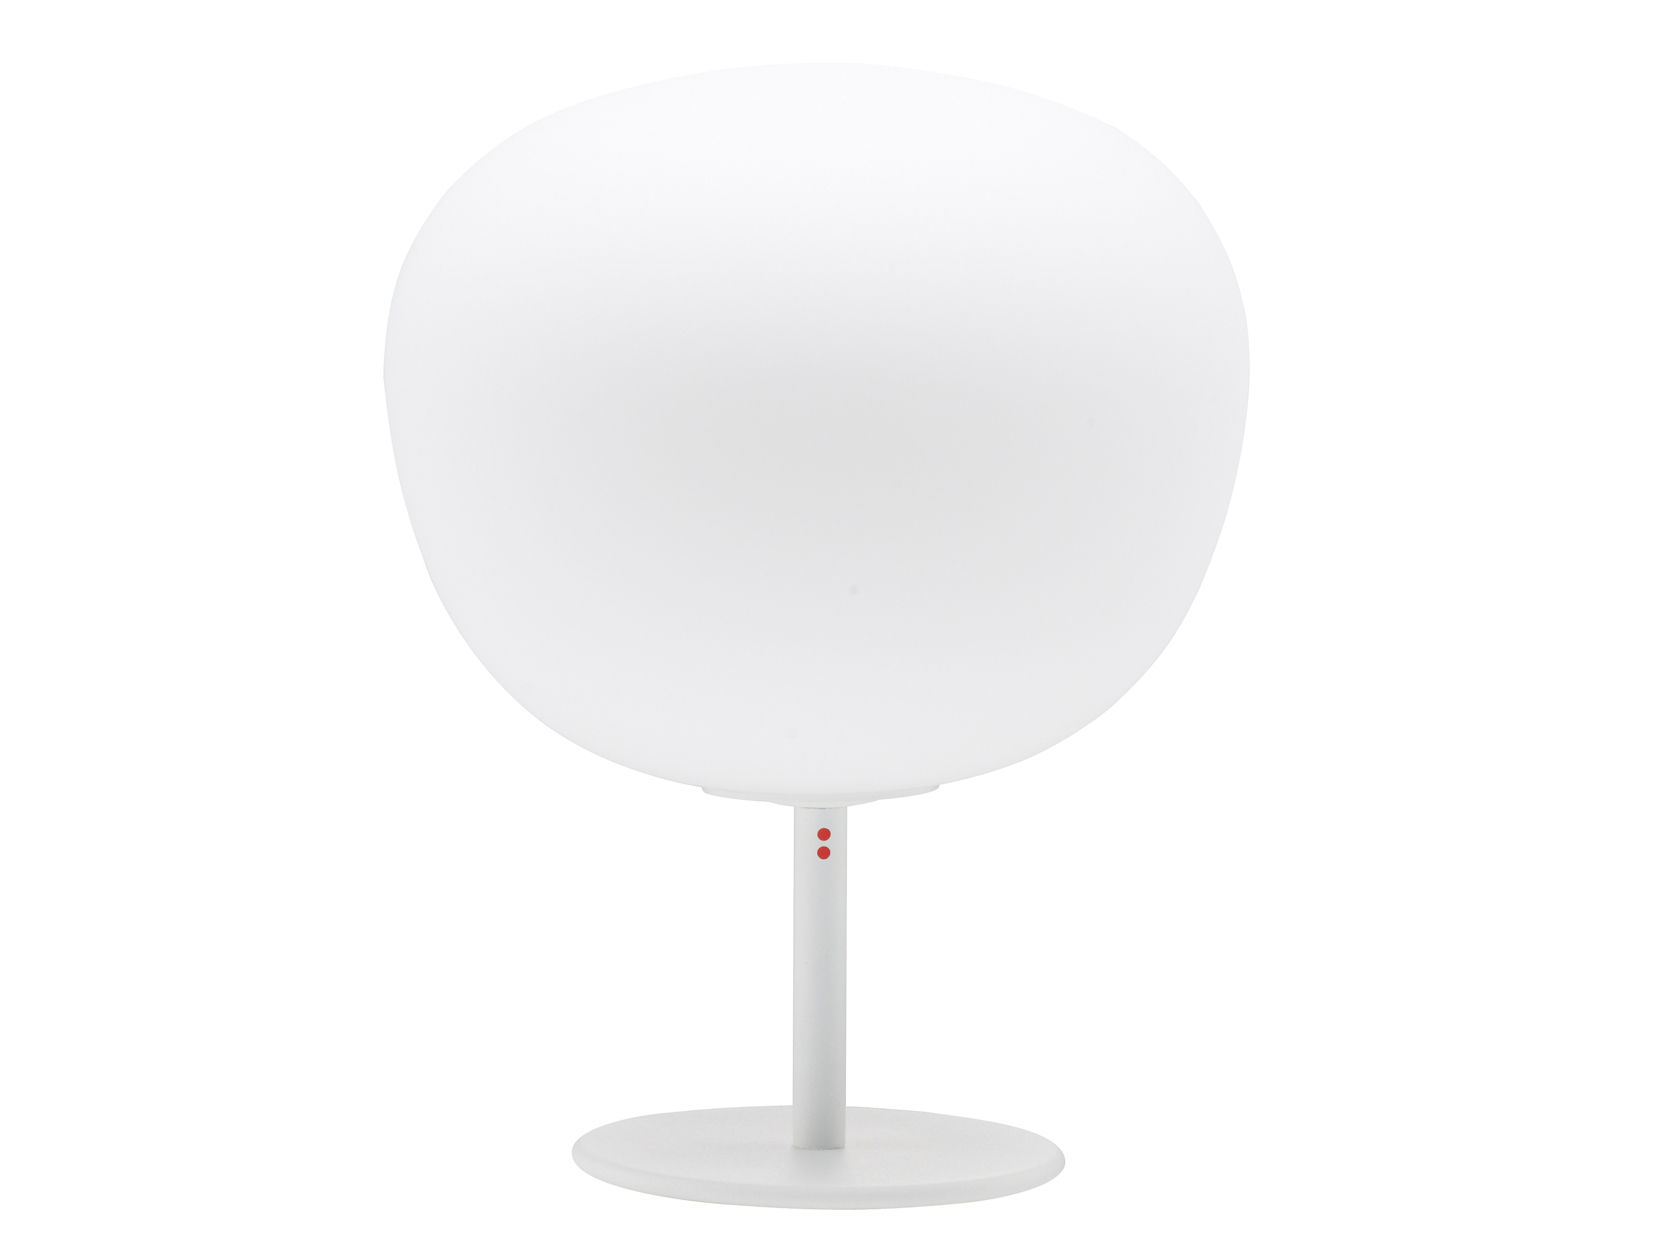 Lighting - Table Lamps - Mochi Table lamp - With leg - Ø 20 x H 26 cm by Fabbian - White - Ø 20 cm - Base - Glass